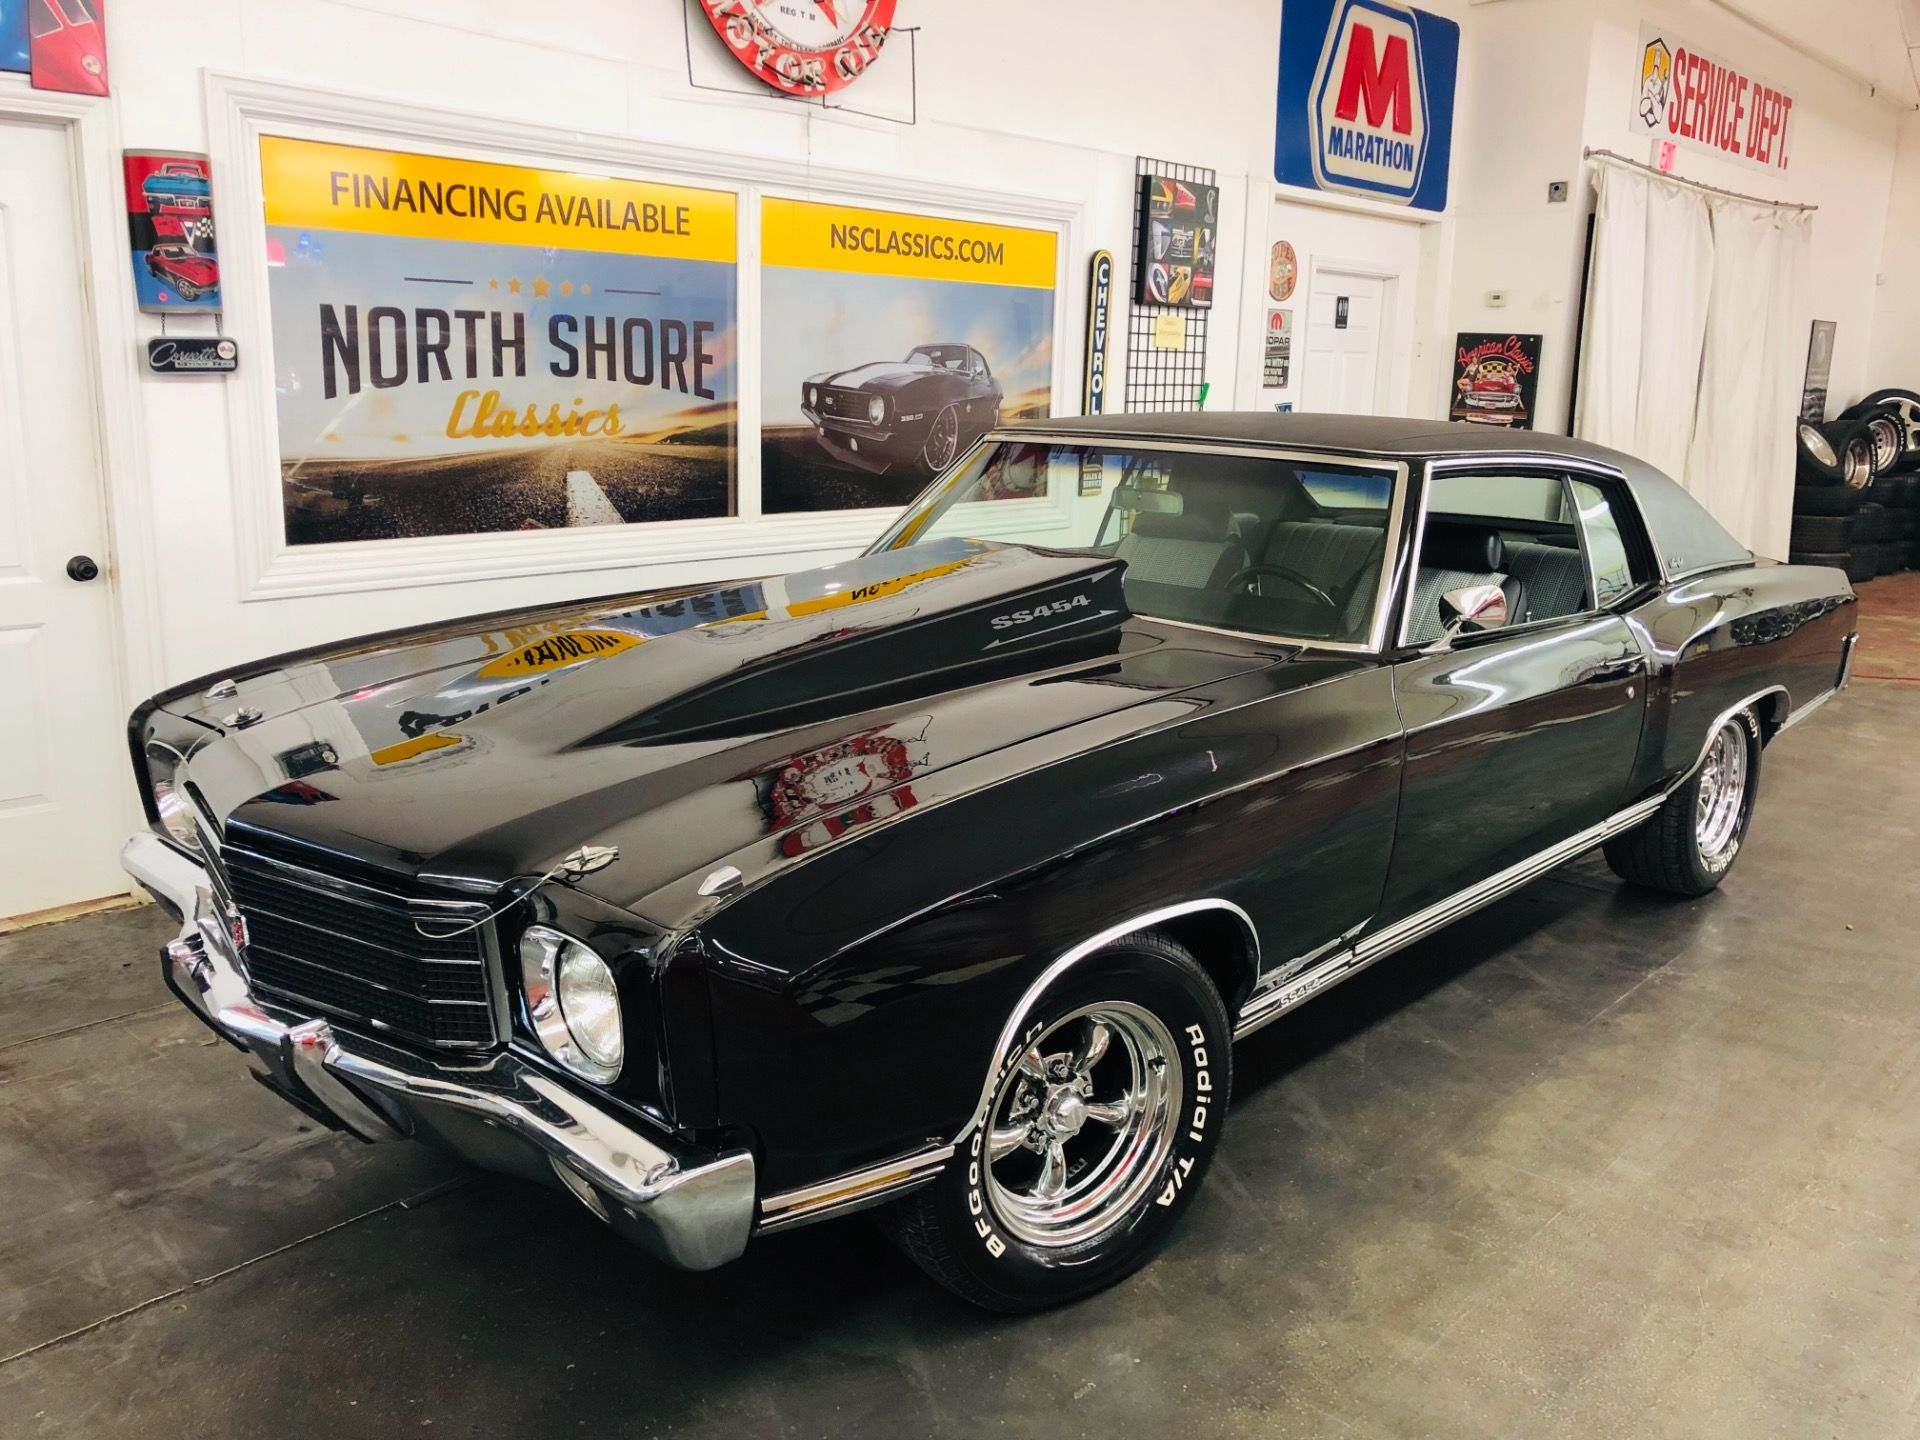 1970 Chevrolet Monte Carlo Big Block 454 Black Reliable Muscle